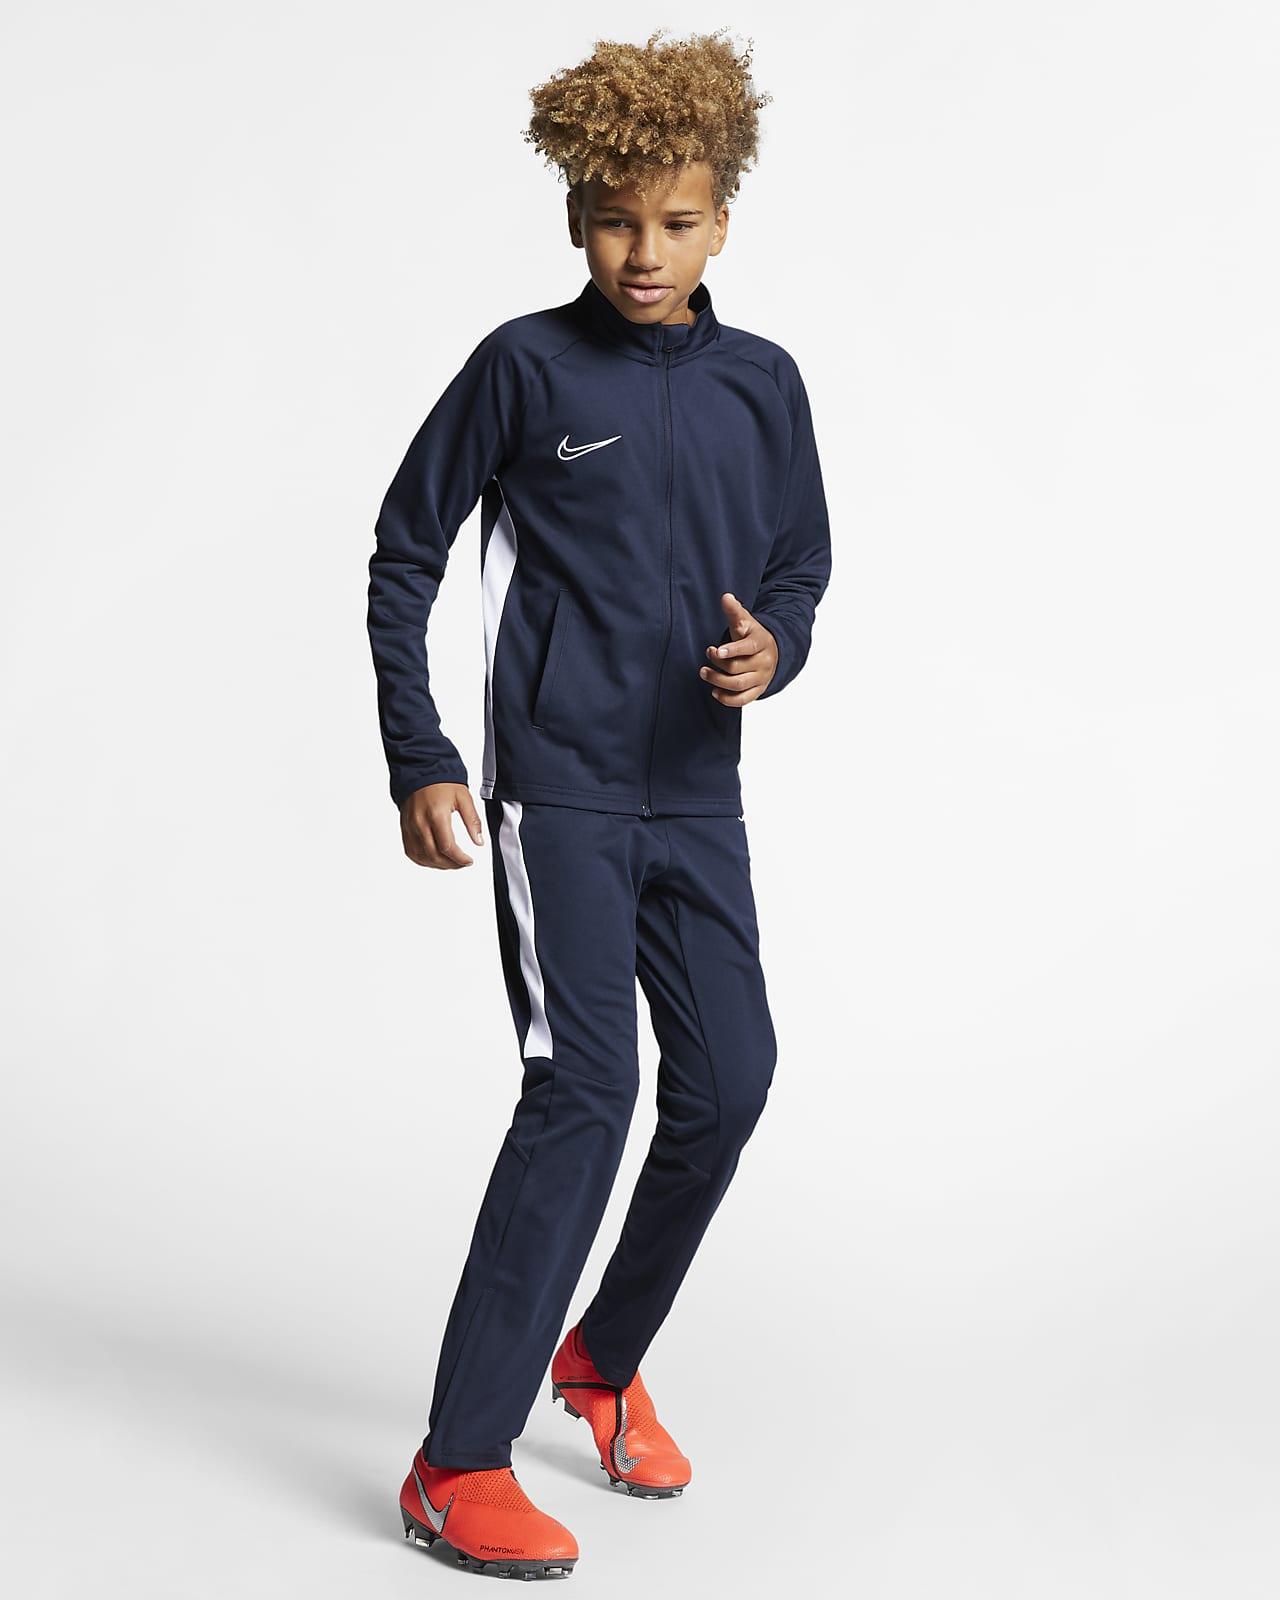 sostén estornudar Exclusivo  Nike Dri-FIT Academy Chándal de fútbol - Niño/a. Nike ES